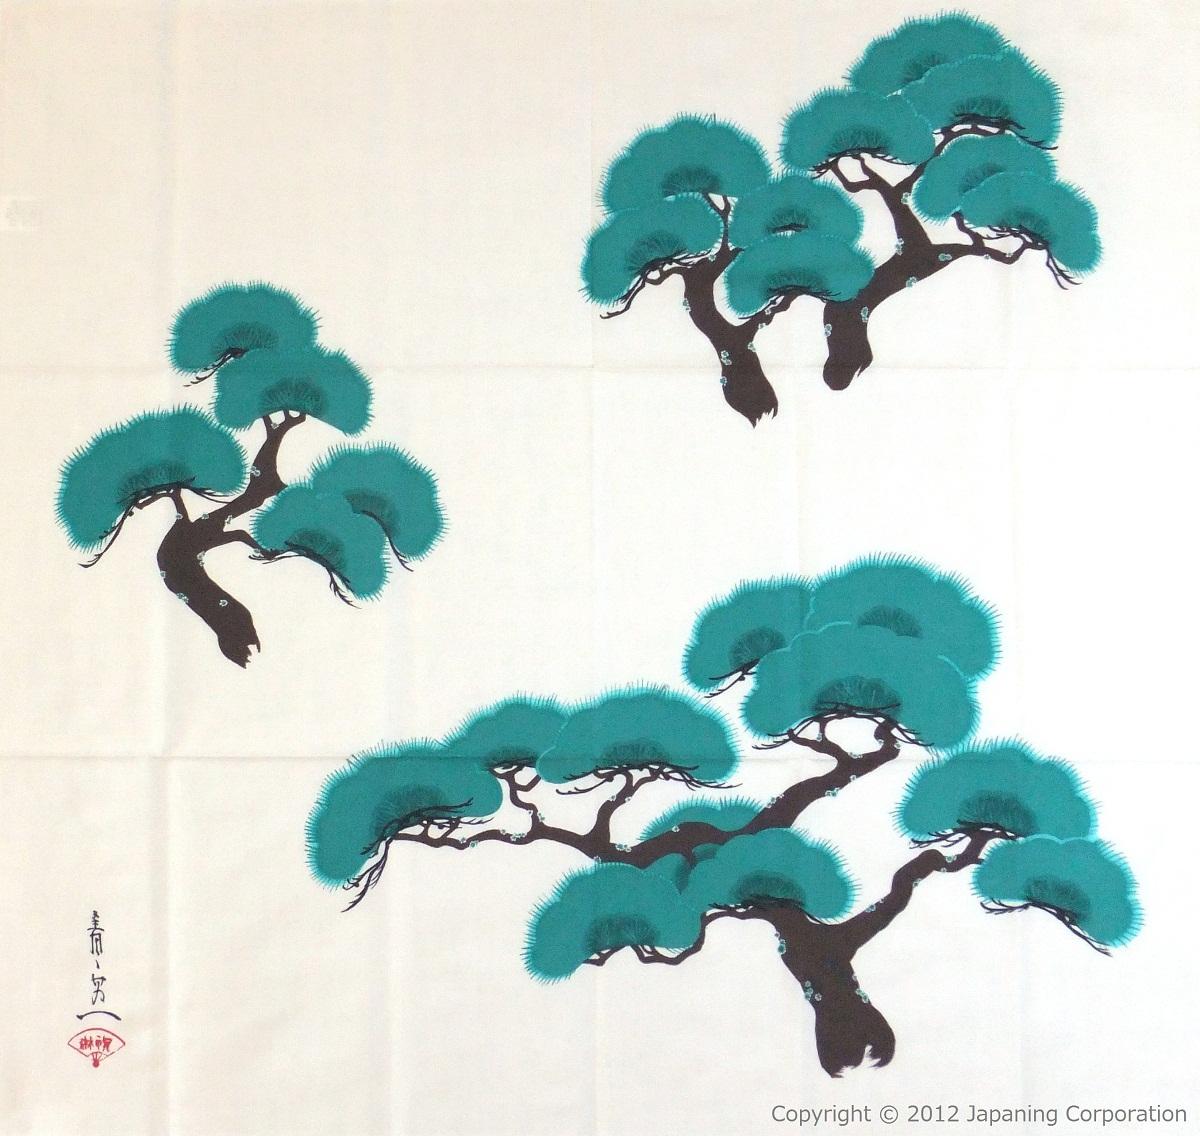 Drawn pine tree japanese Antique Handmade antique cm) Shop